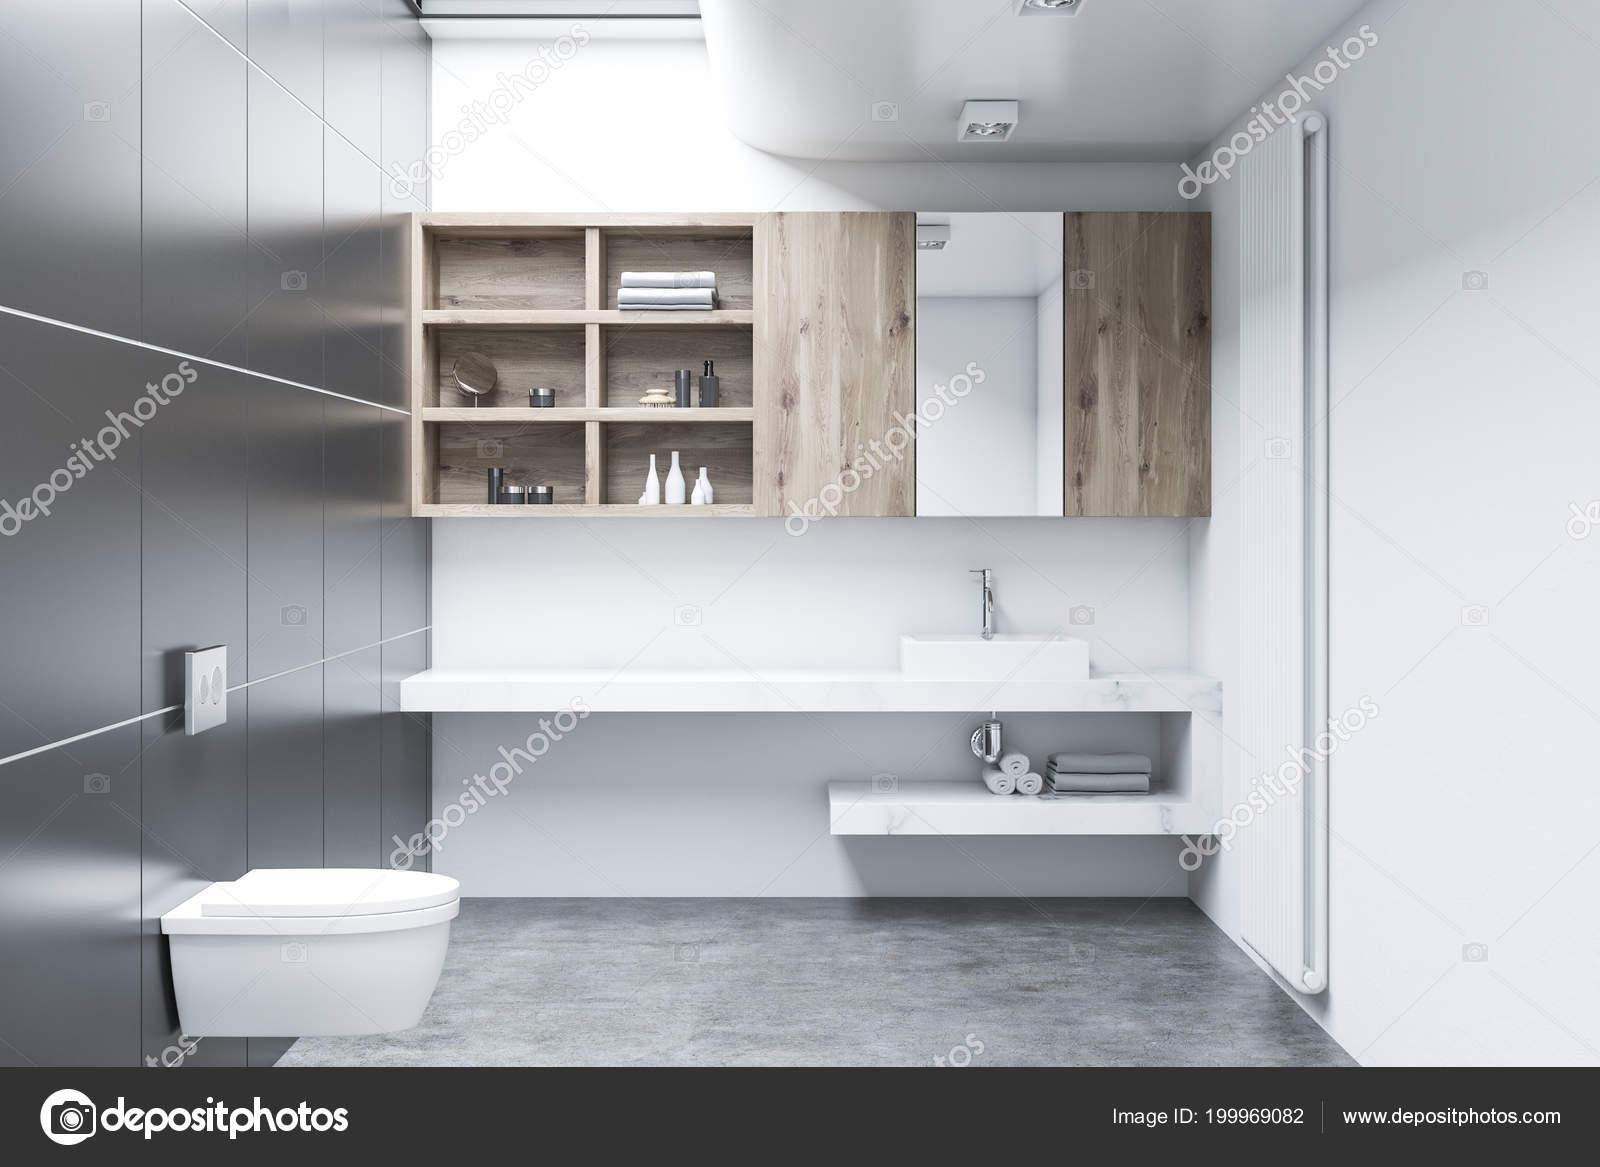 Pavimento Bianco E Grigio : Interni lavabo bianco grigio con pavimento cemento doppio lavabo